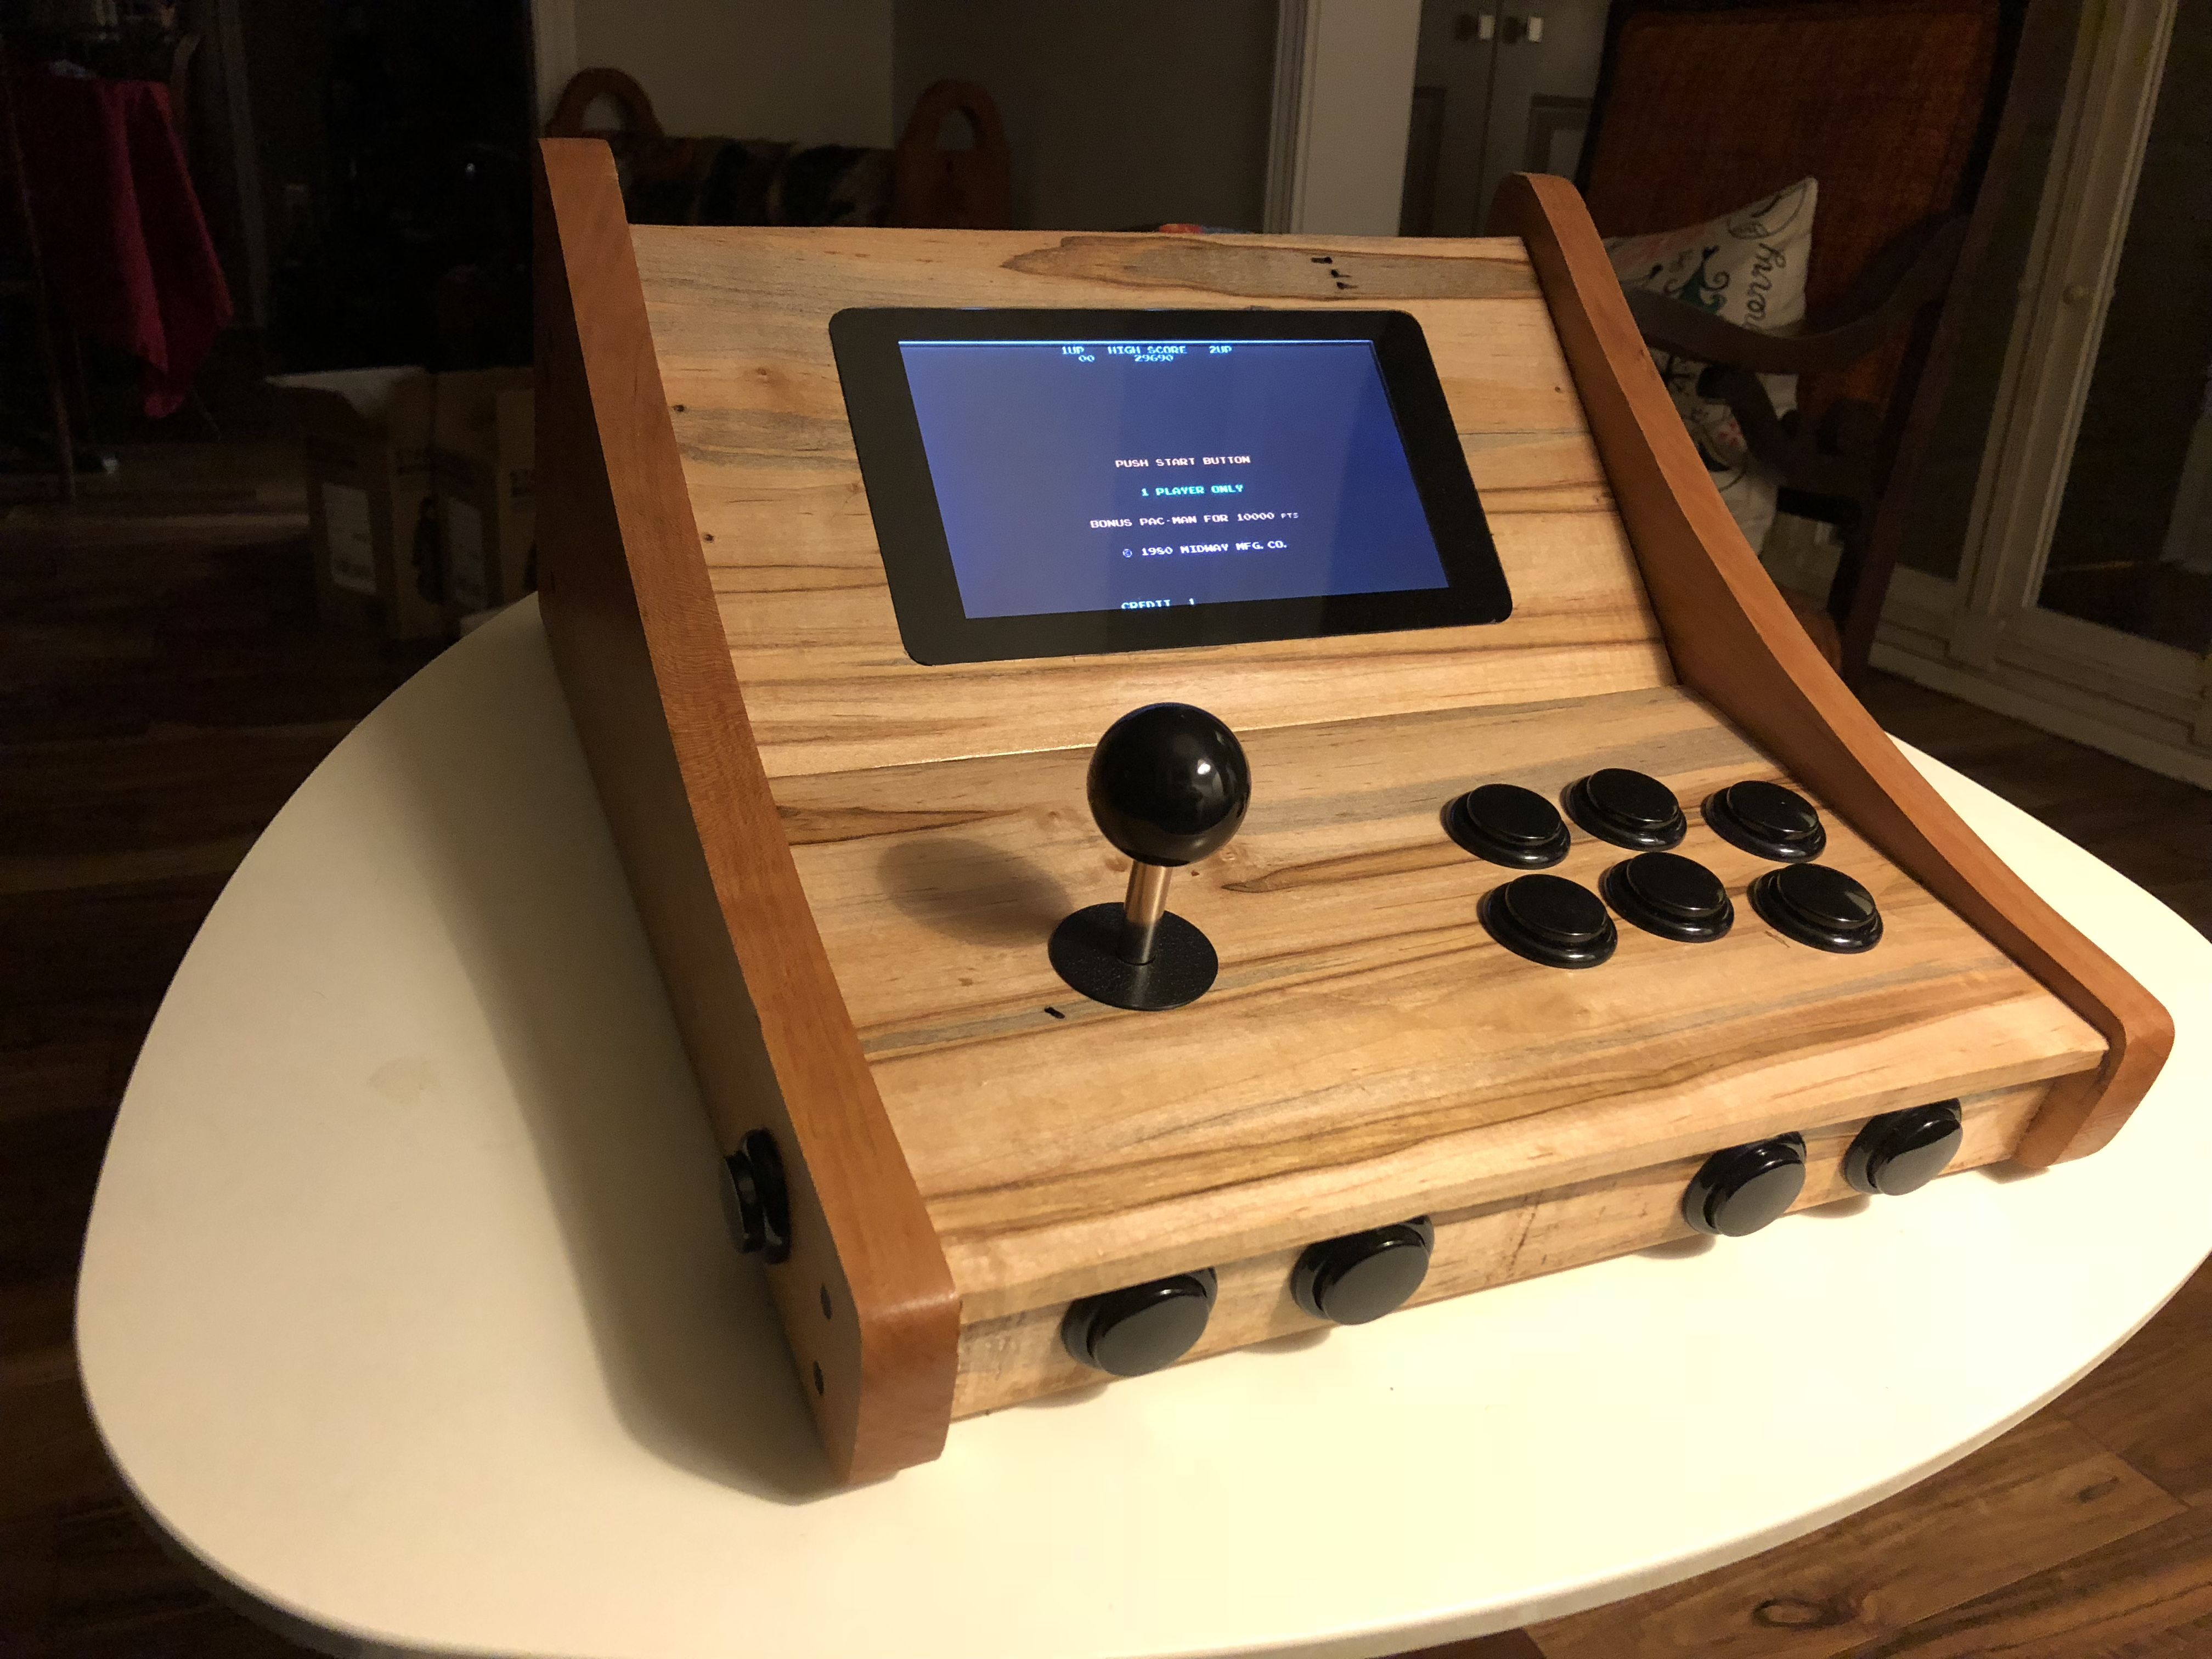 A RetroPie Console | Fight Stick | Retropie arcade, Mini